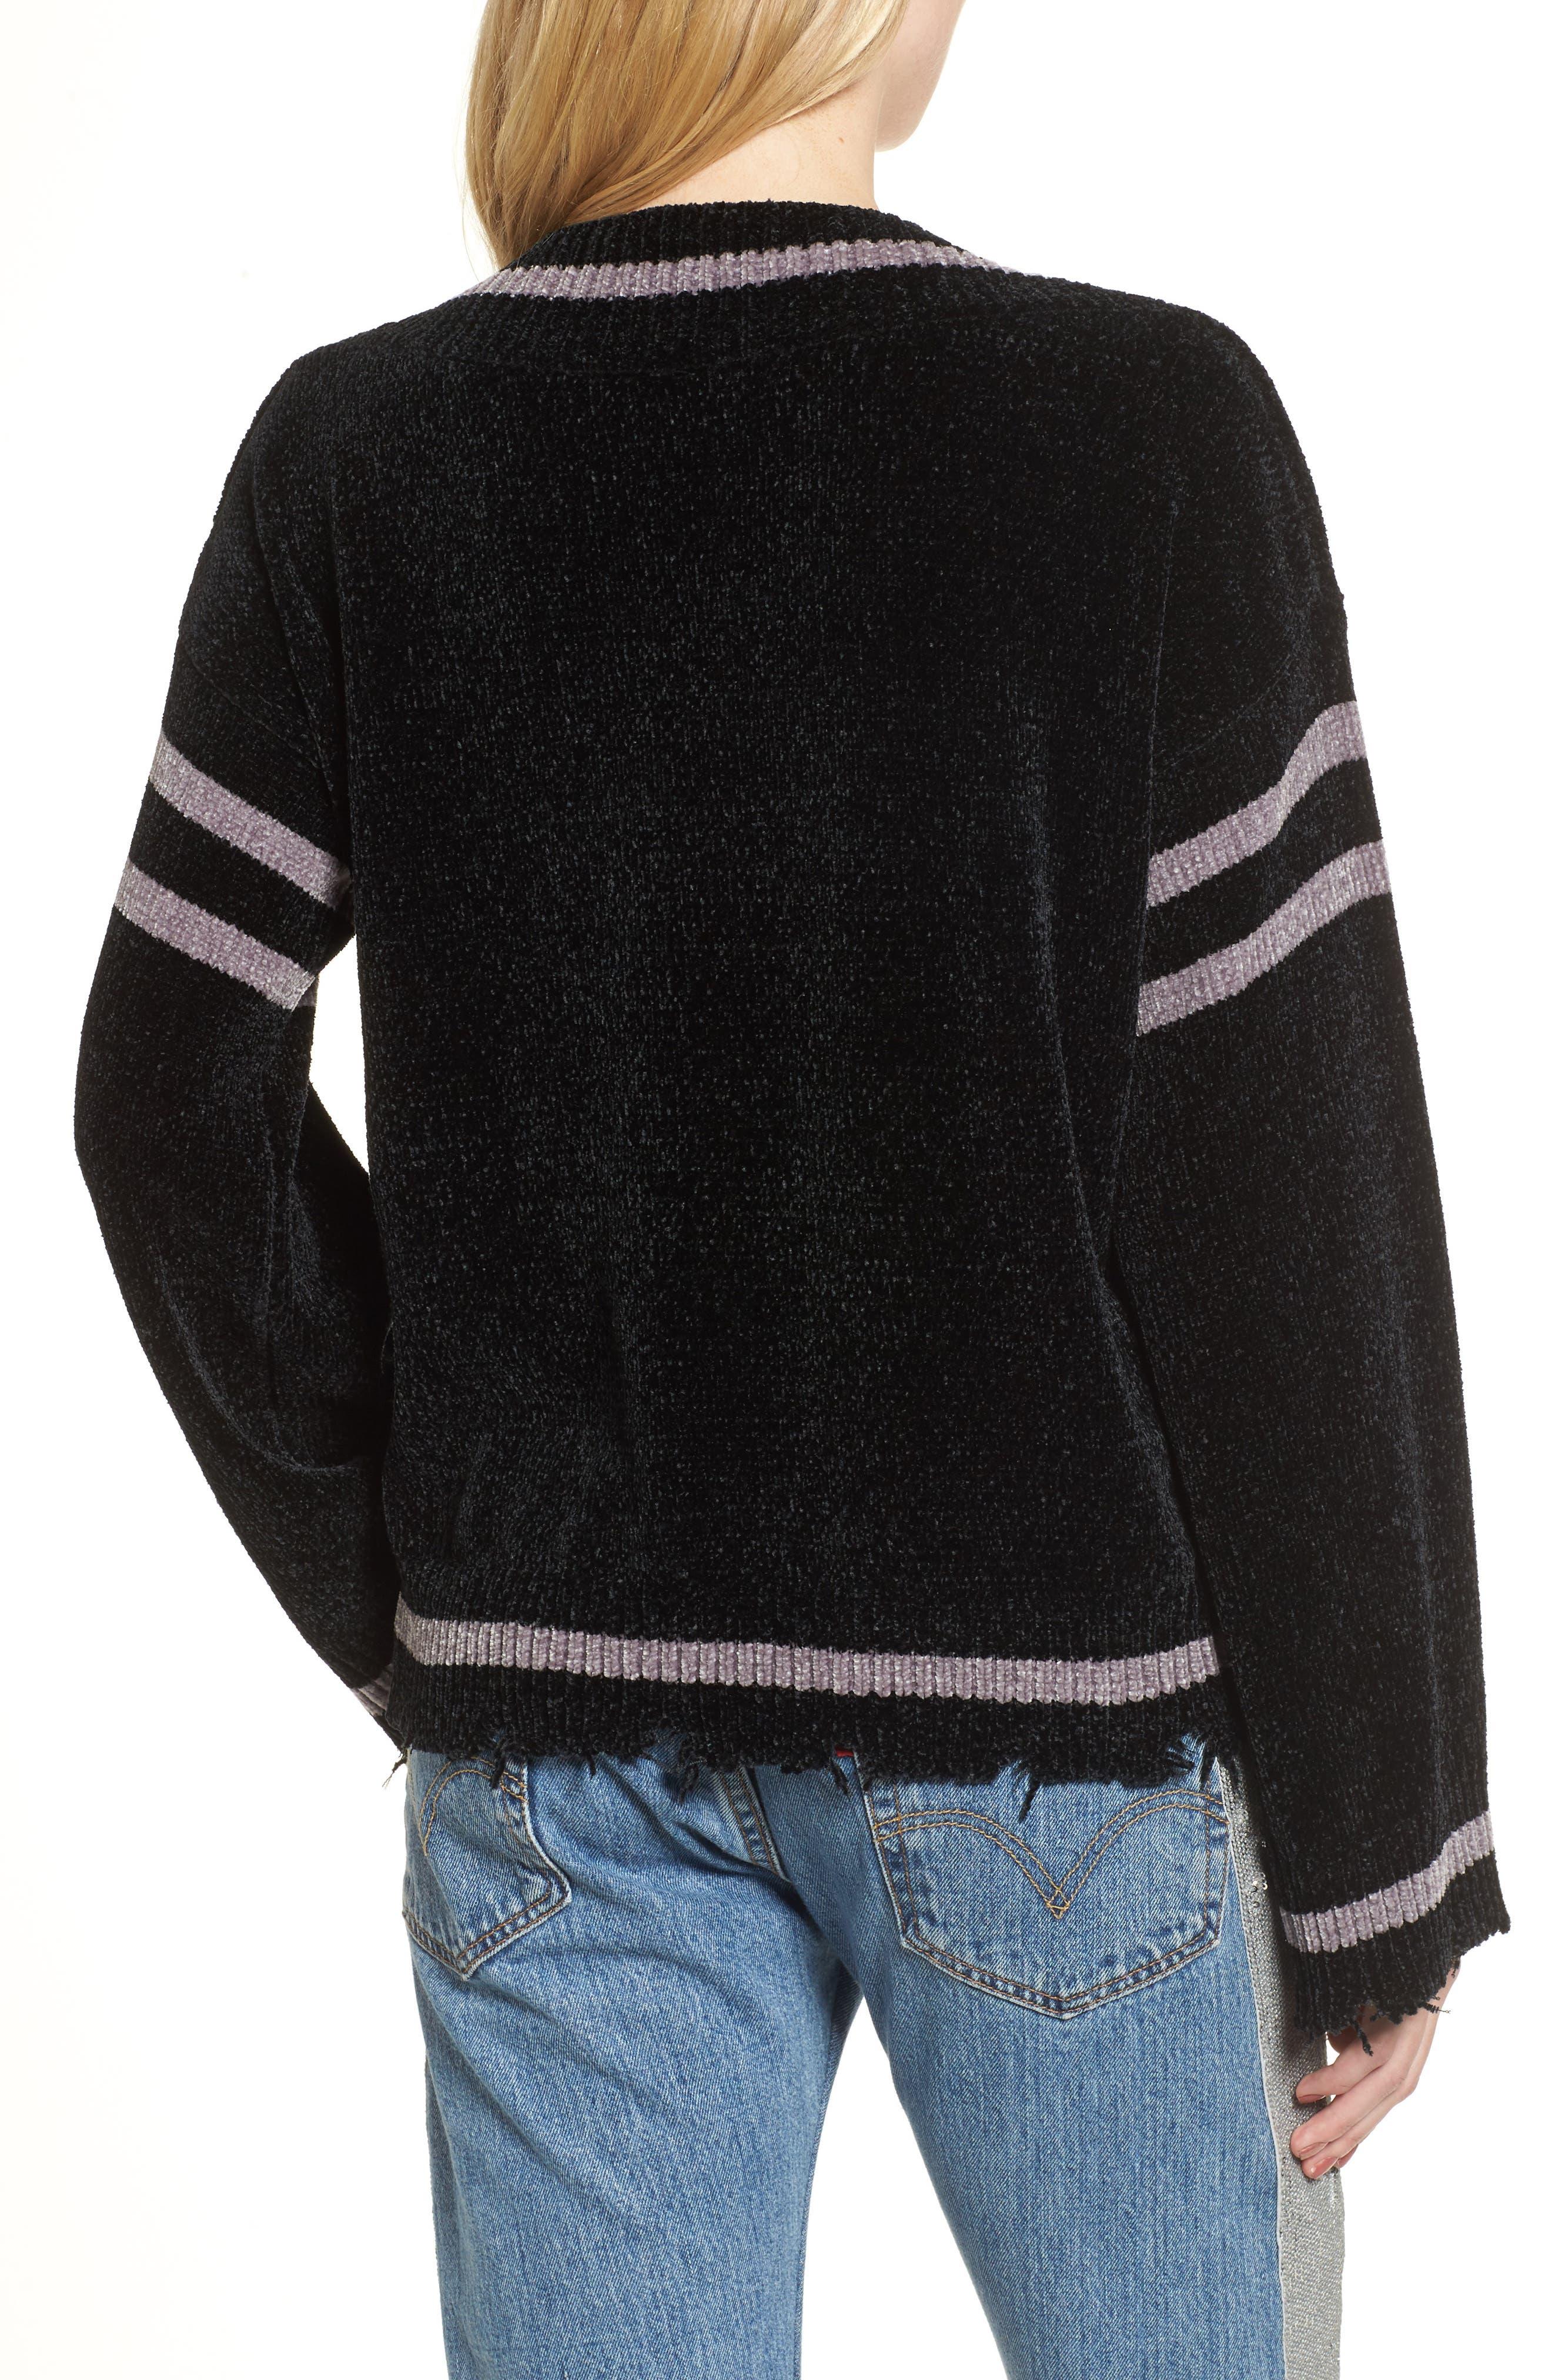 Oversize V-Neck Sweater,                             Alternate thumbnail 2, color,                             BLACK/ MED. HEATHER GREY